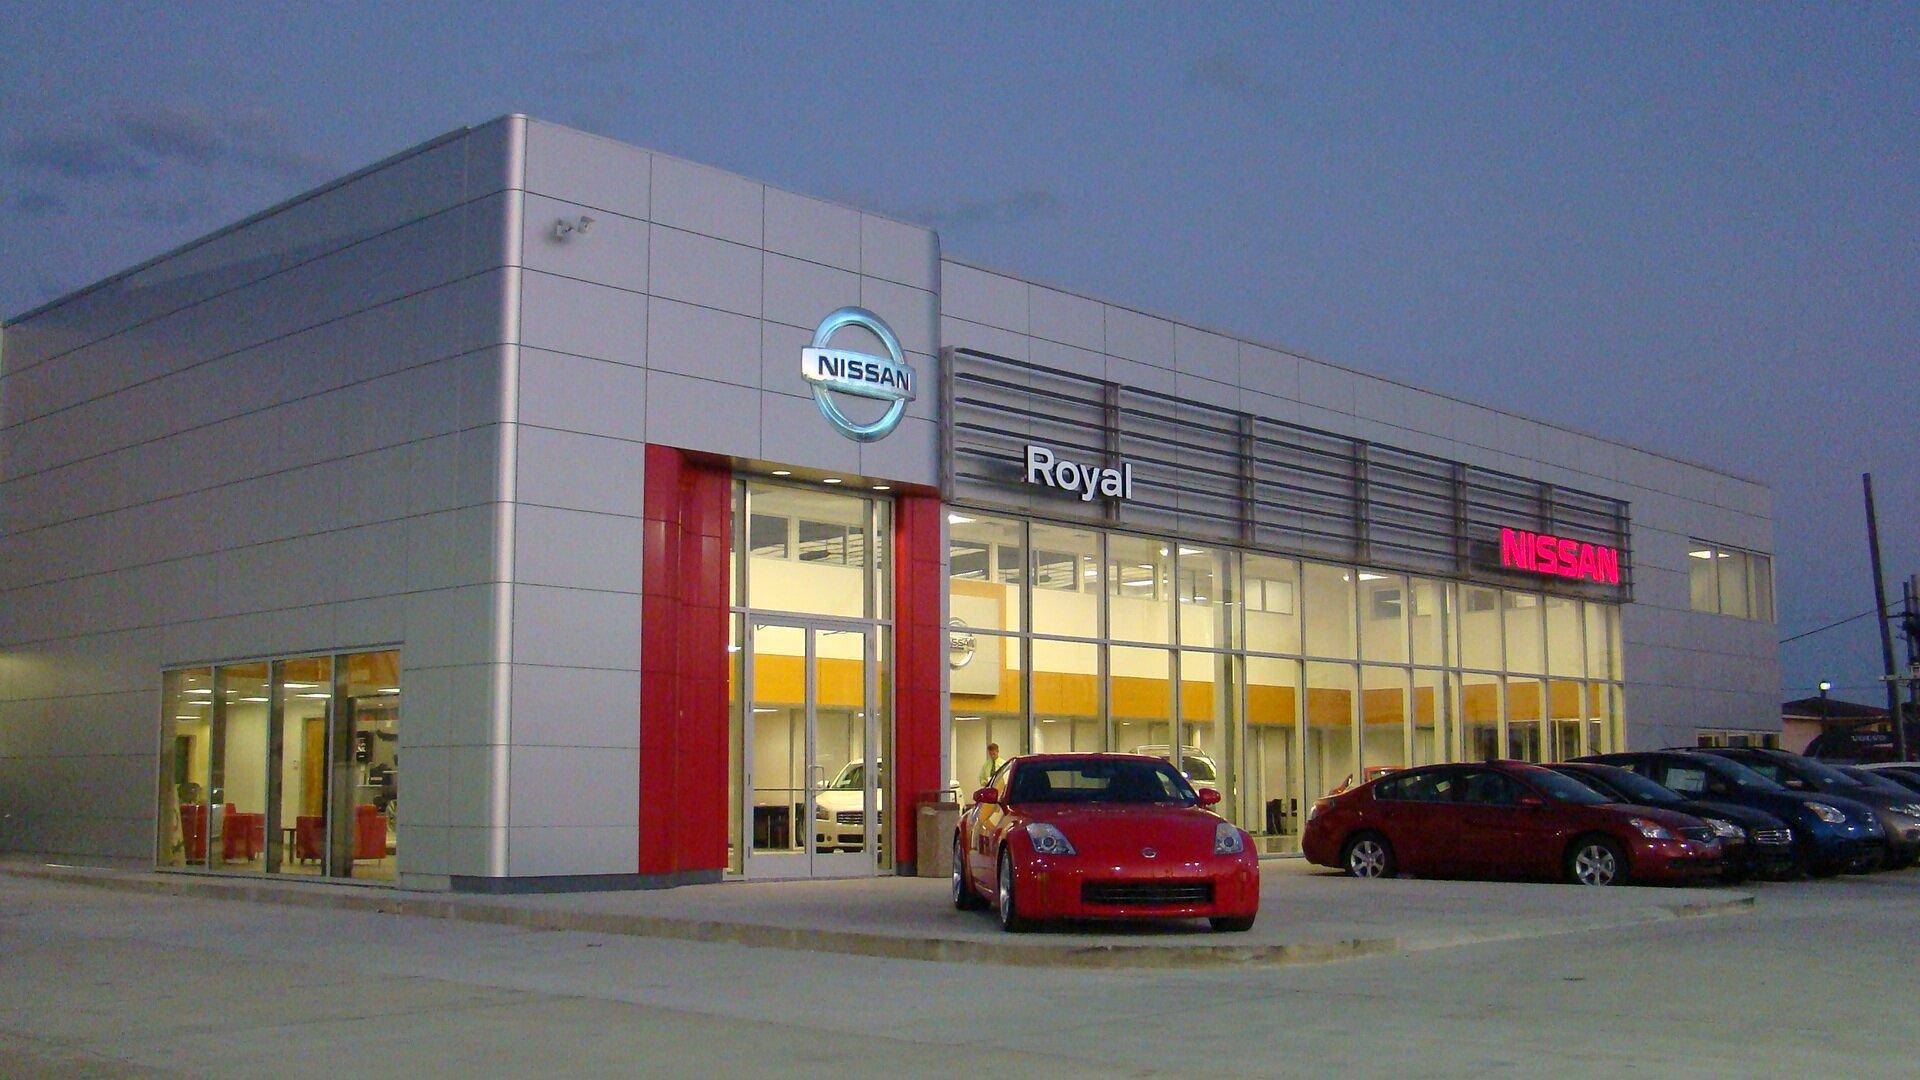 Royal Nissan Baton Rouge >> Royal Nissan Royal Nissan Twitter